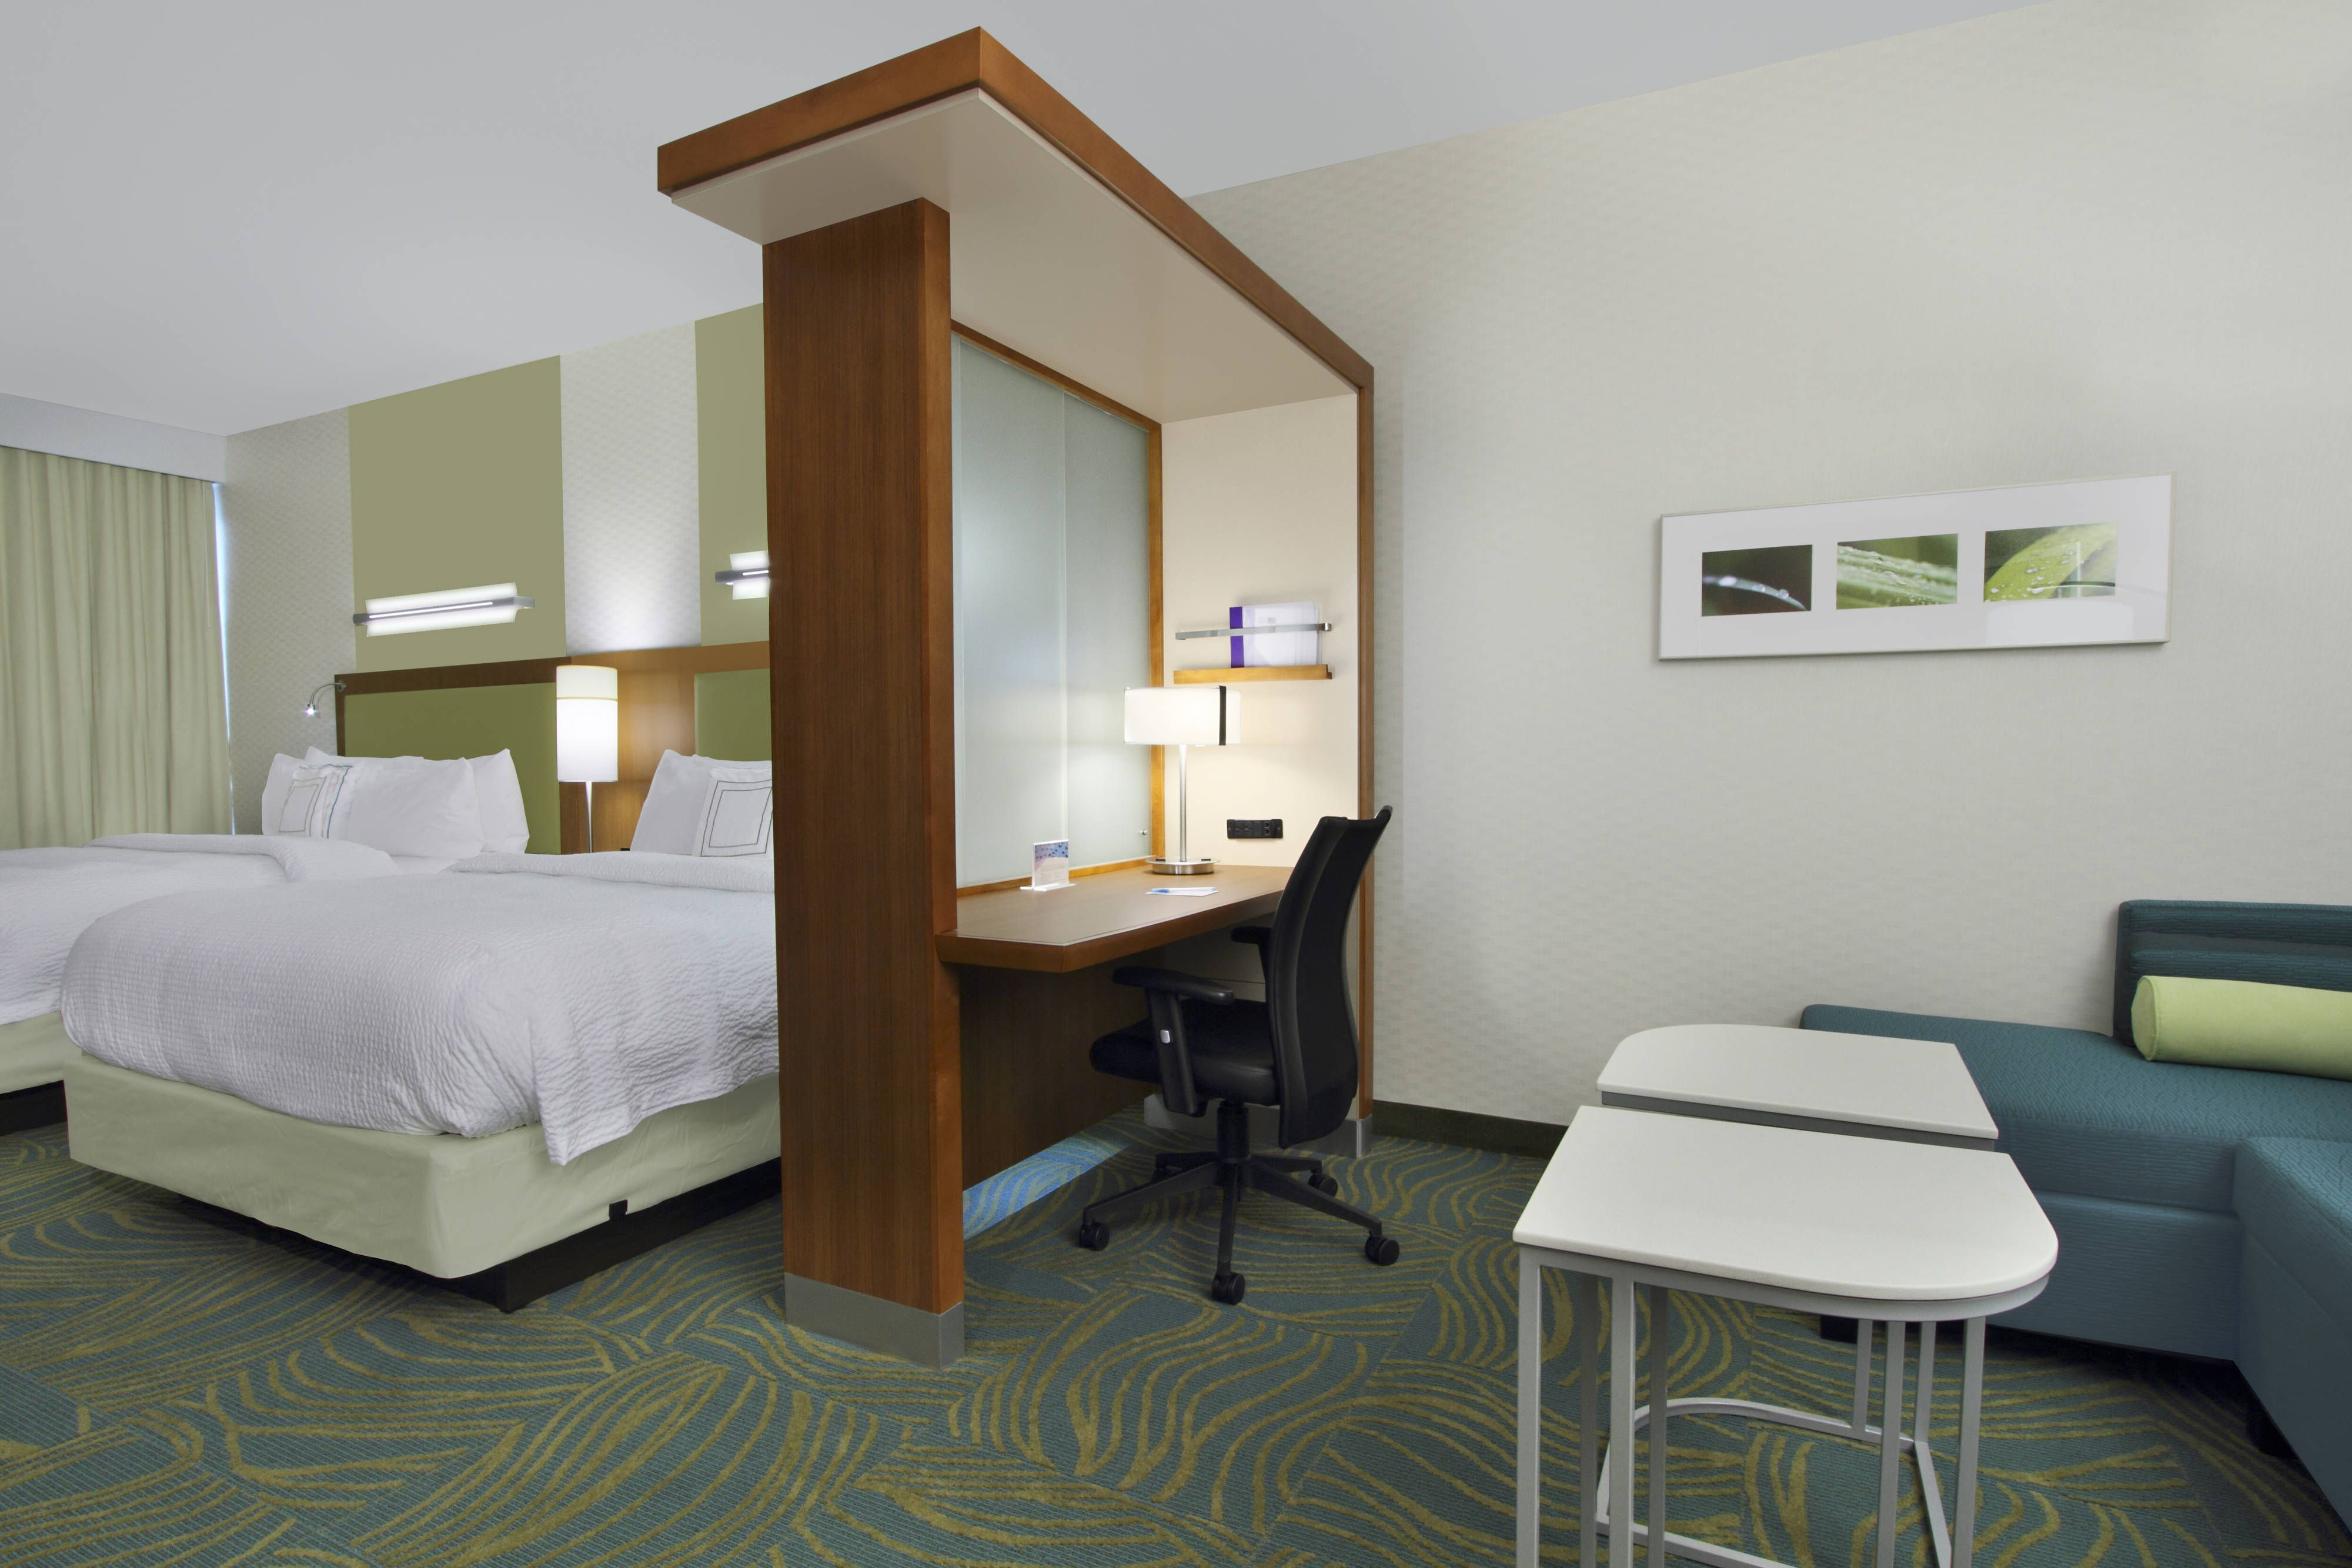 Springhill Suites Houston I 10 West Energy Corridor Queen Queen Suite Comfortable Suite Visiting Suites Springhill Home Decor